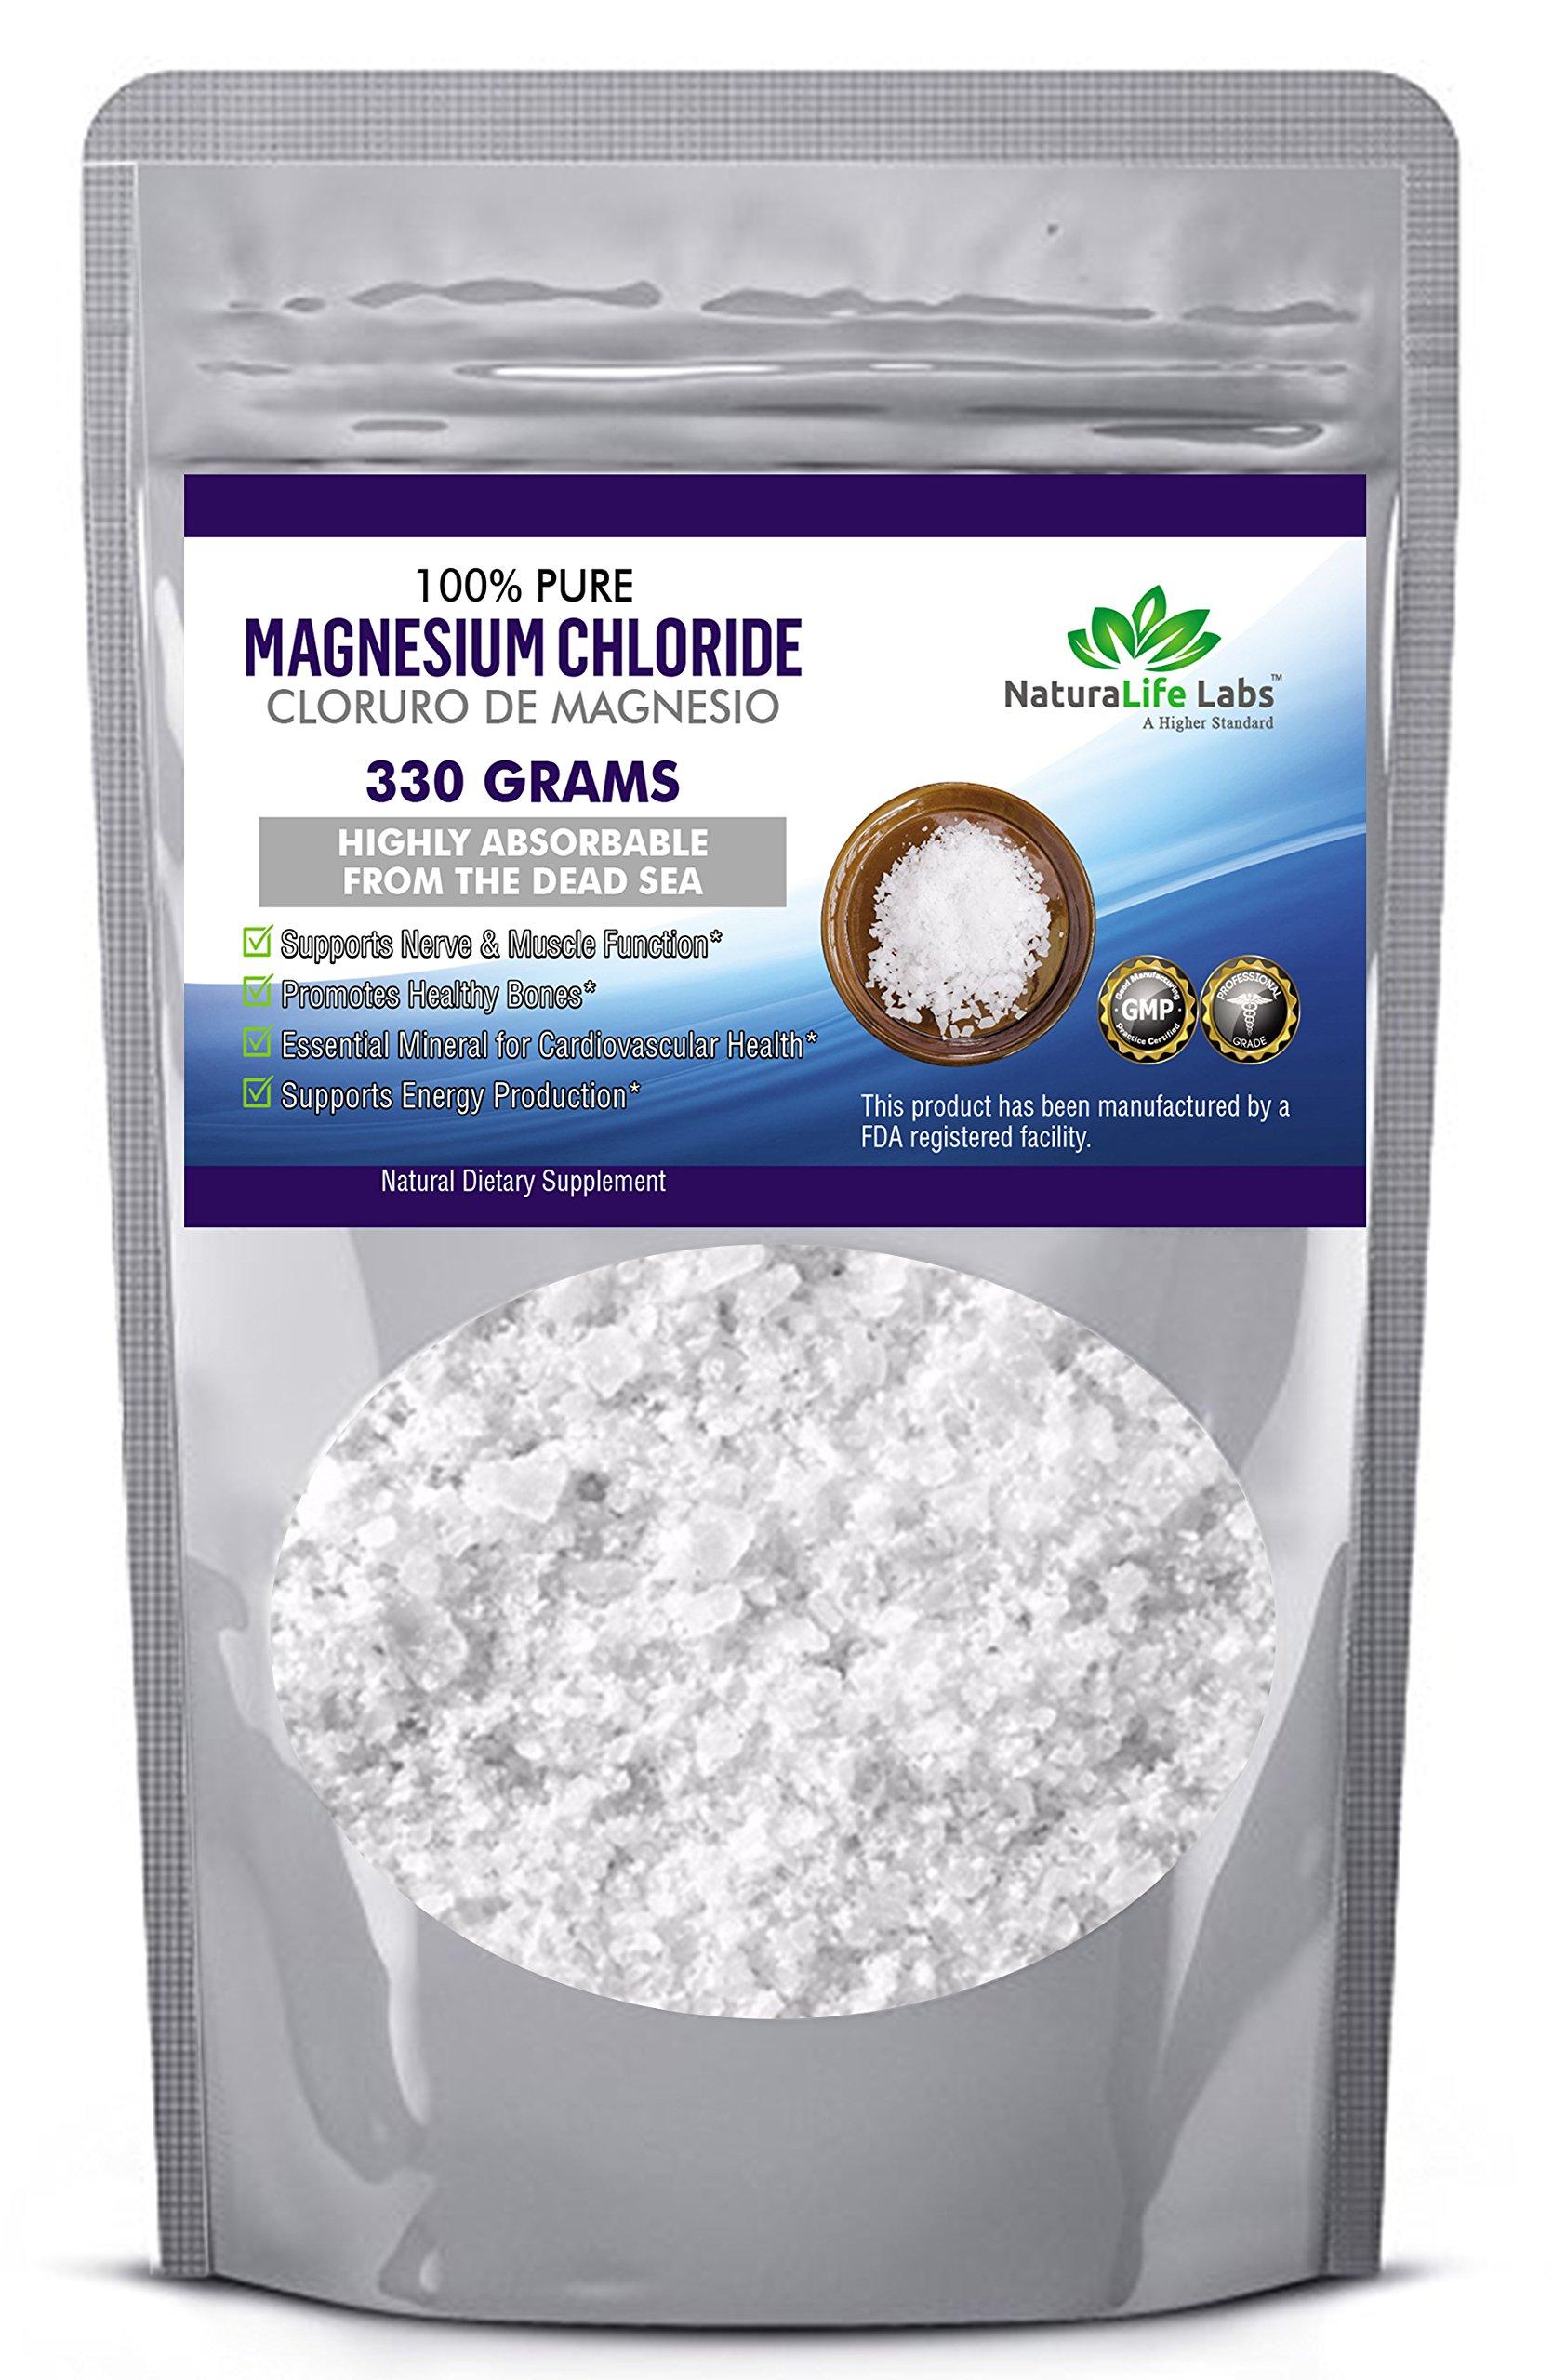 Magnesium Chloride Food Grade Edible Cloruro de Magnesio 330 grams 100% Pure Higly Absorbable from